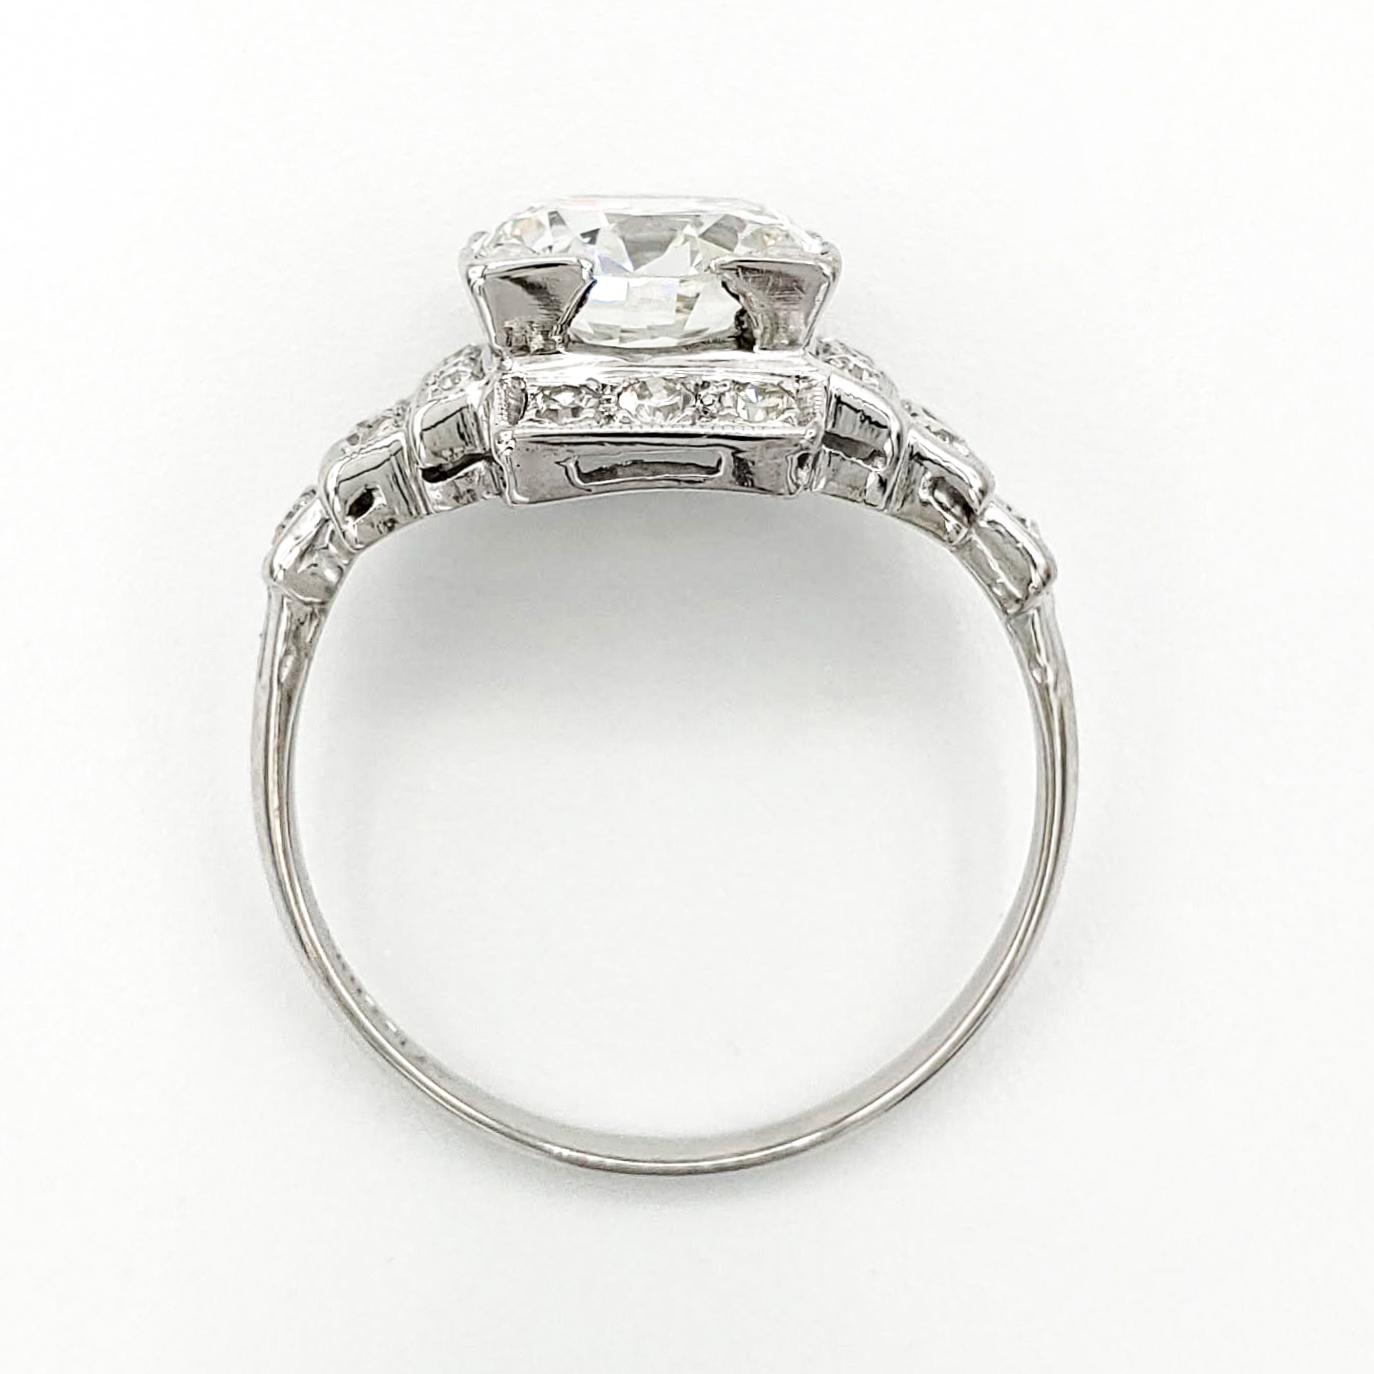 vintage-platinum-engagement-ring-with-1-78-carat-old-european-cut-diamond-gia-i-vs2